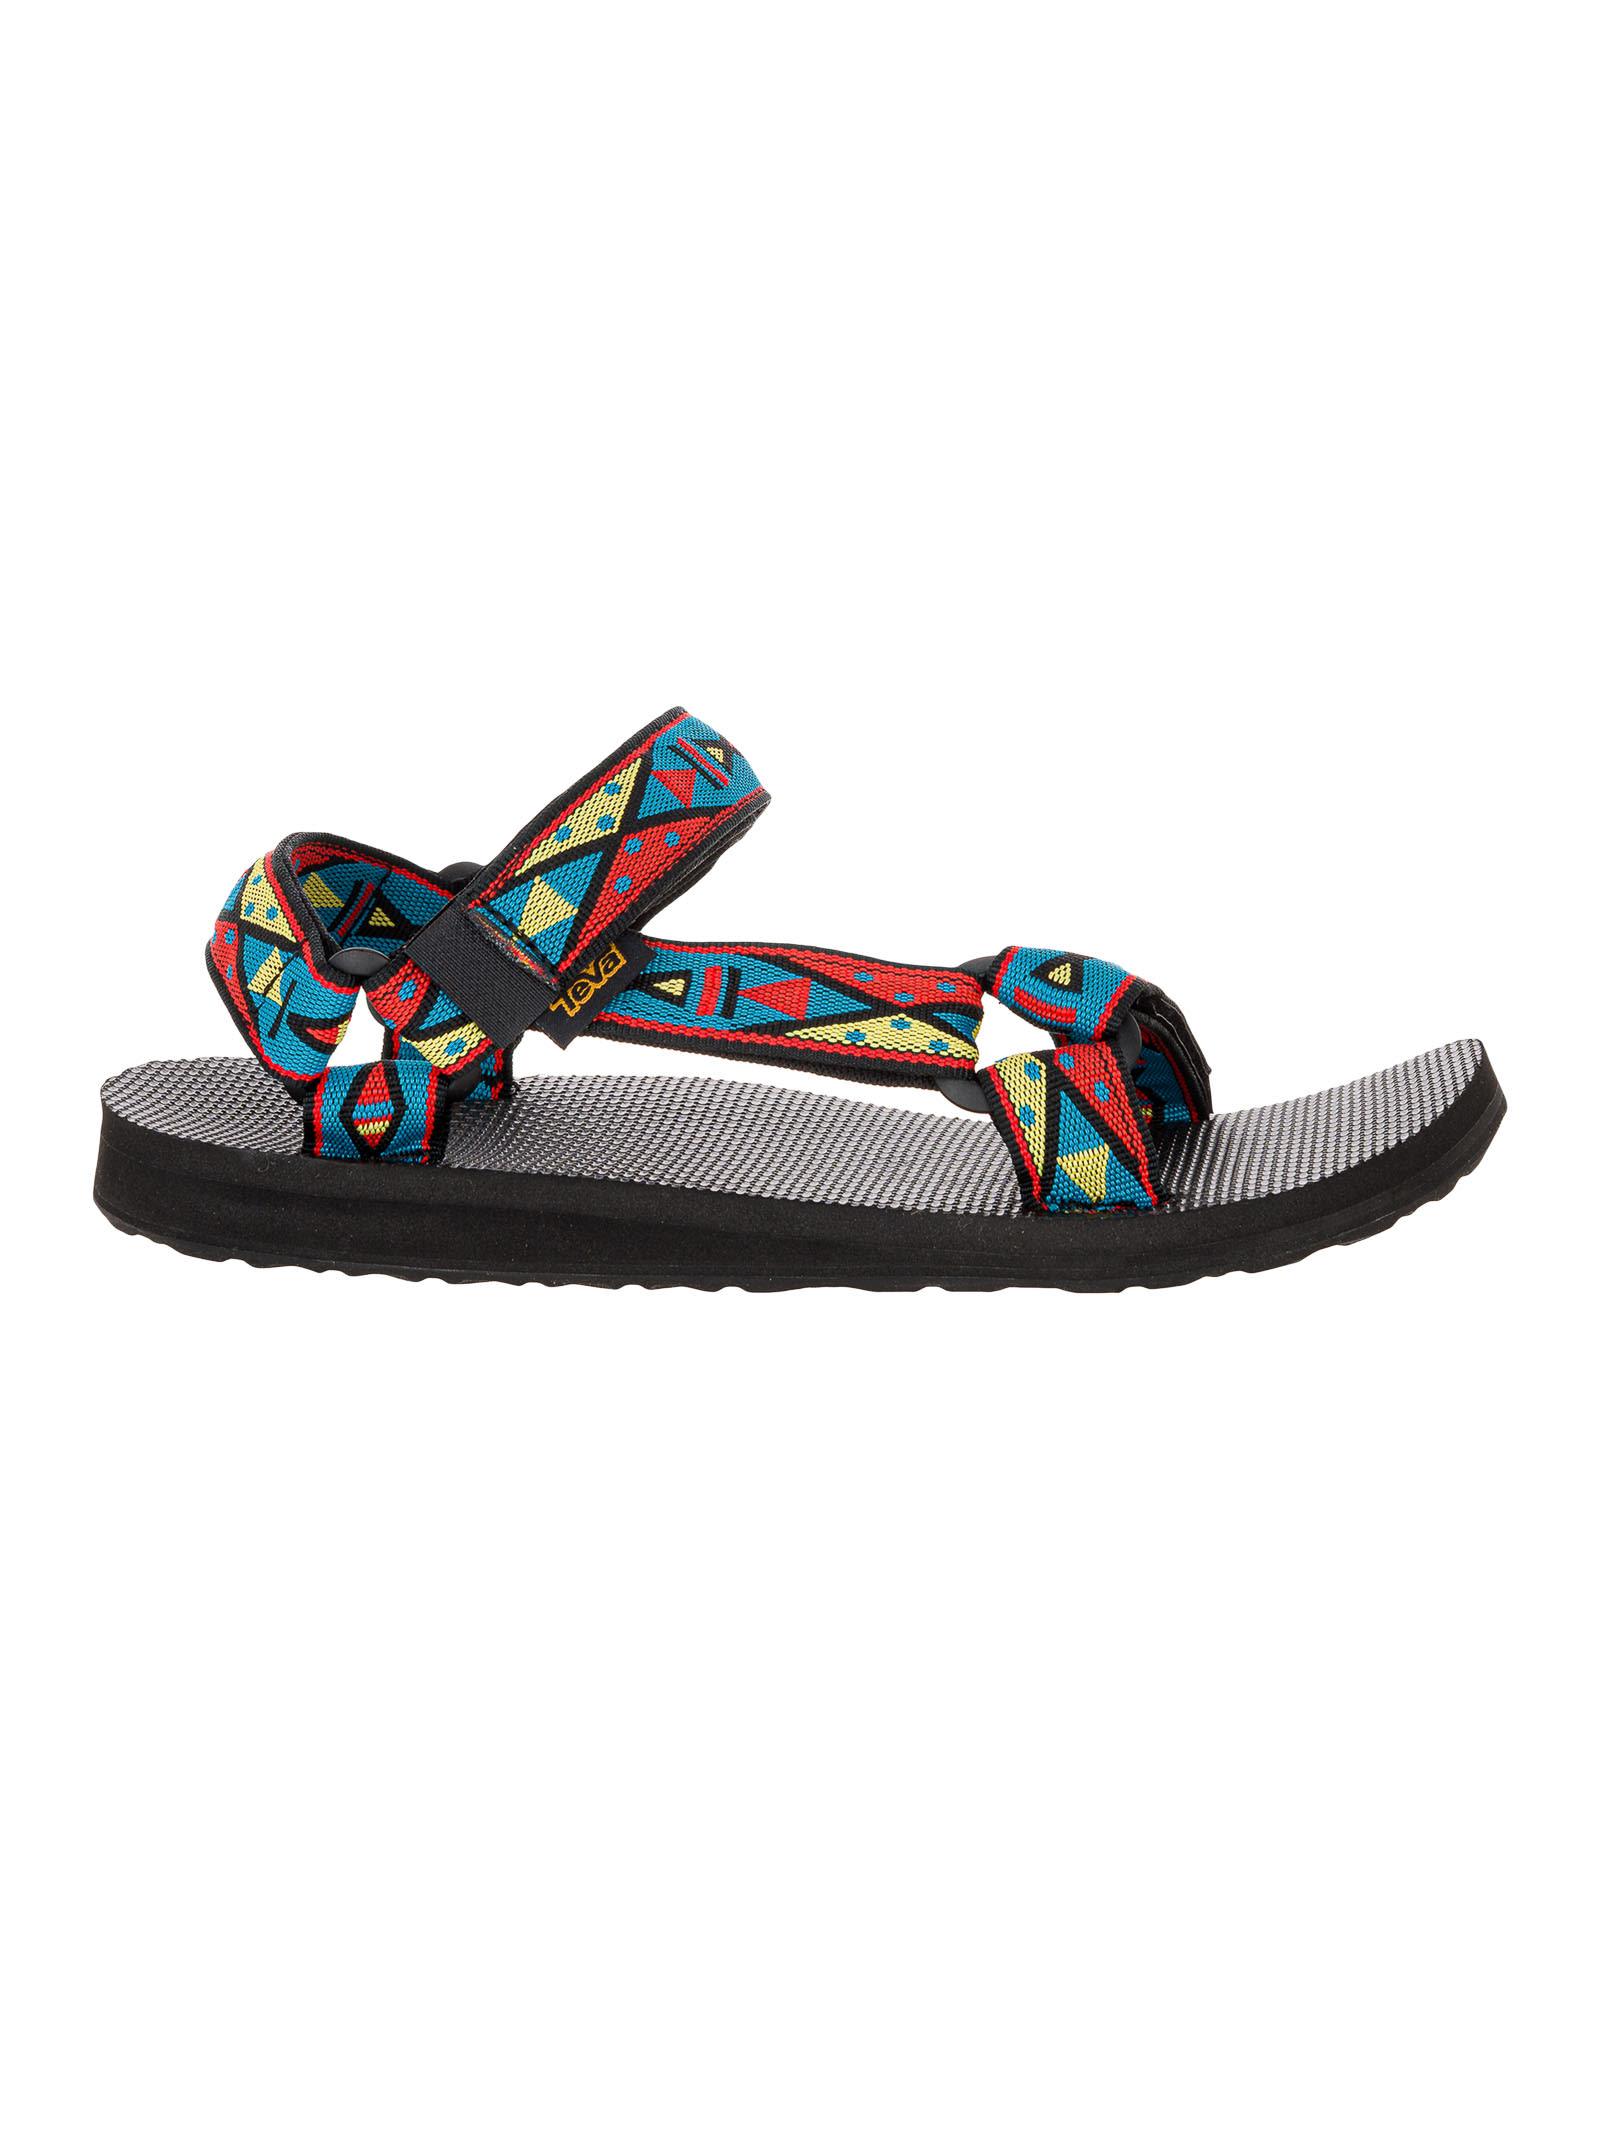 Teva Sandals ORIGINAL UNIVERSAL SANDALS